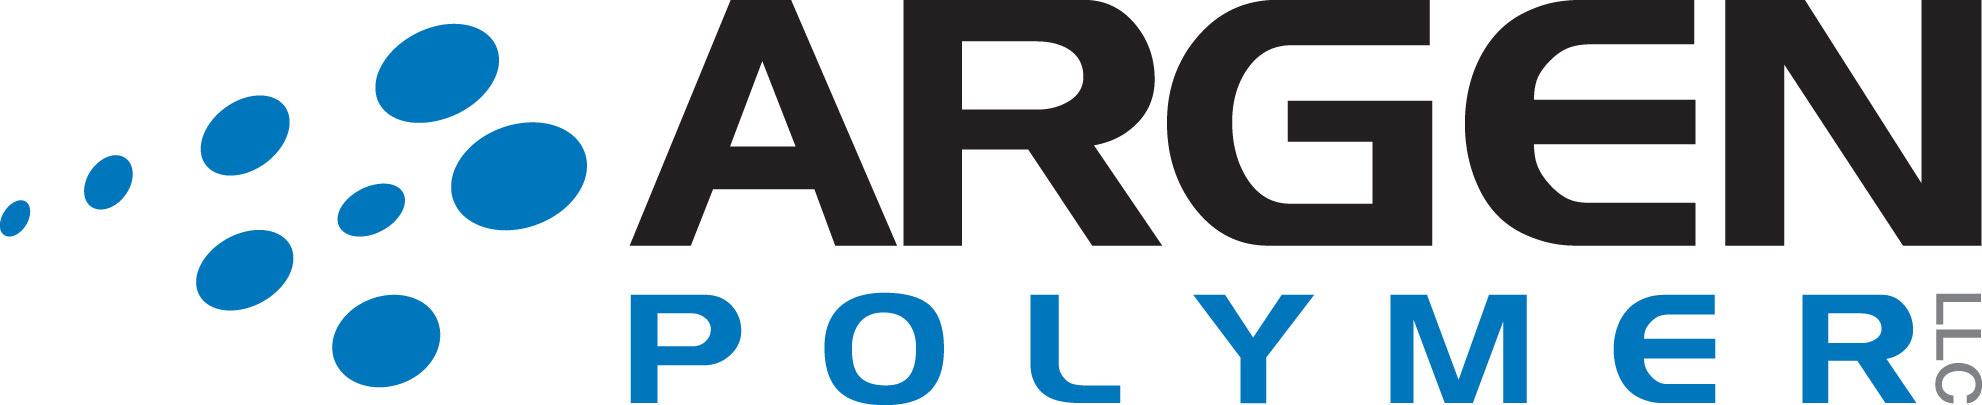 Argen Polymer LLC